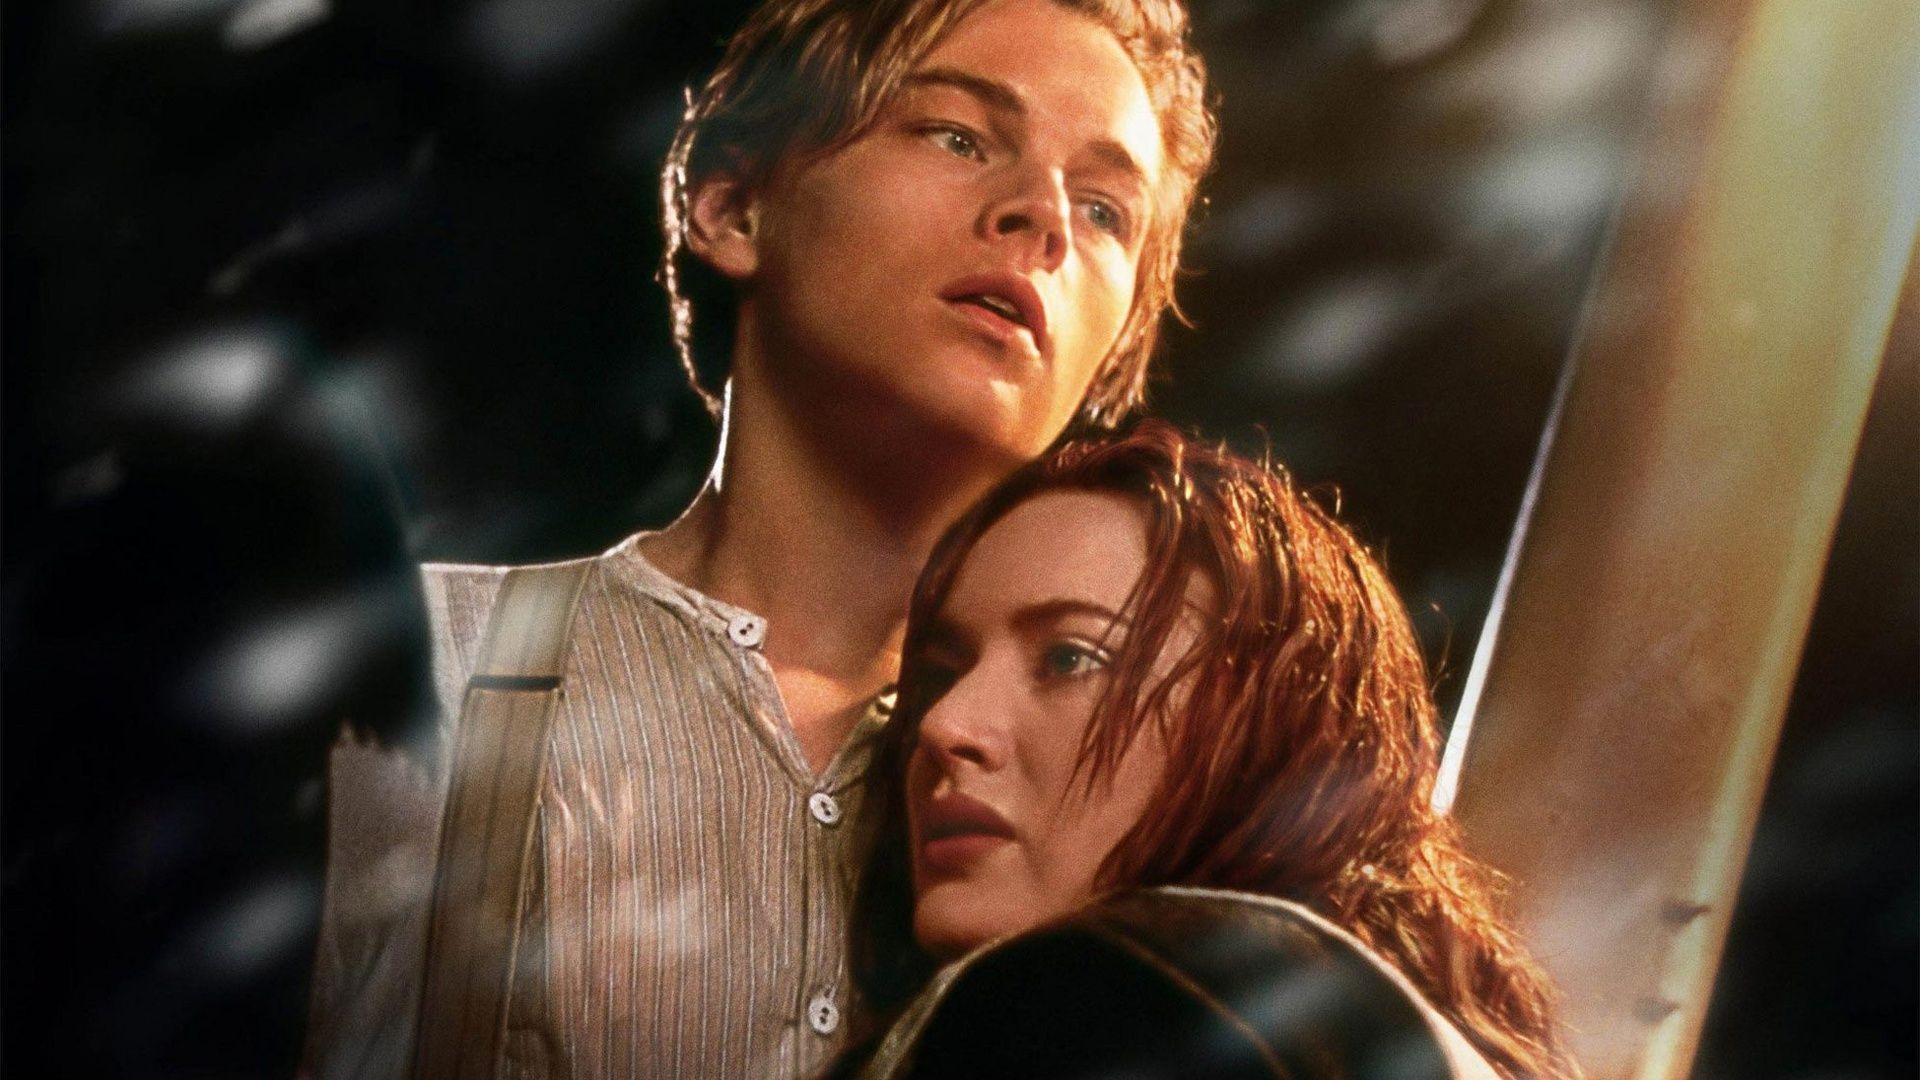 Leonardo DiCaprio and Kate Winslet in Titanic Wallpaper .